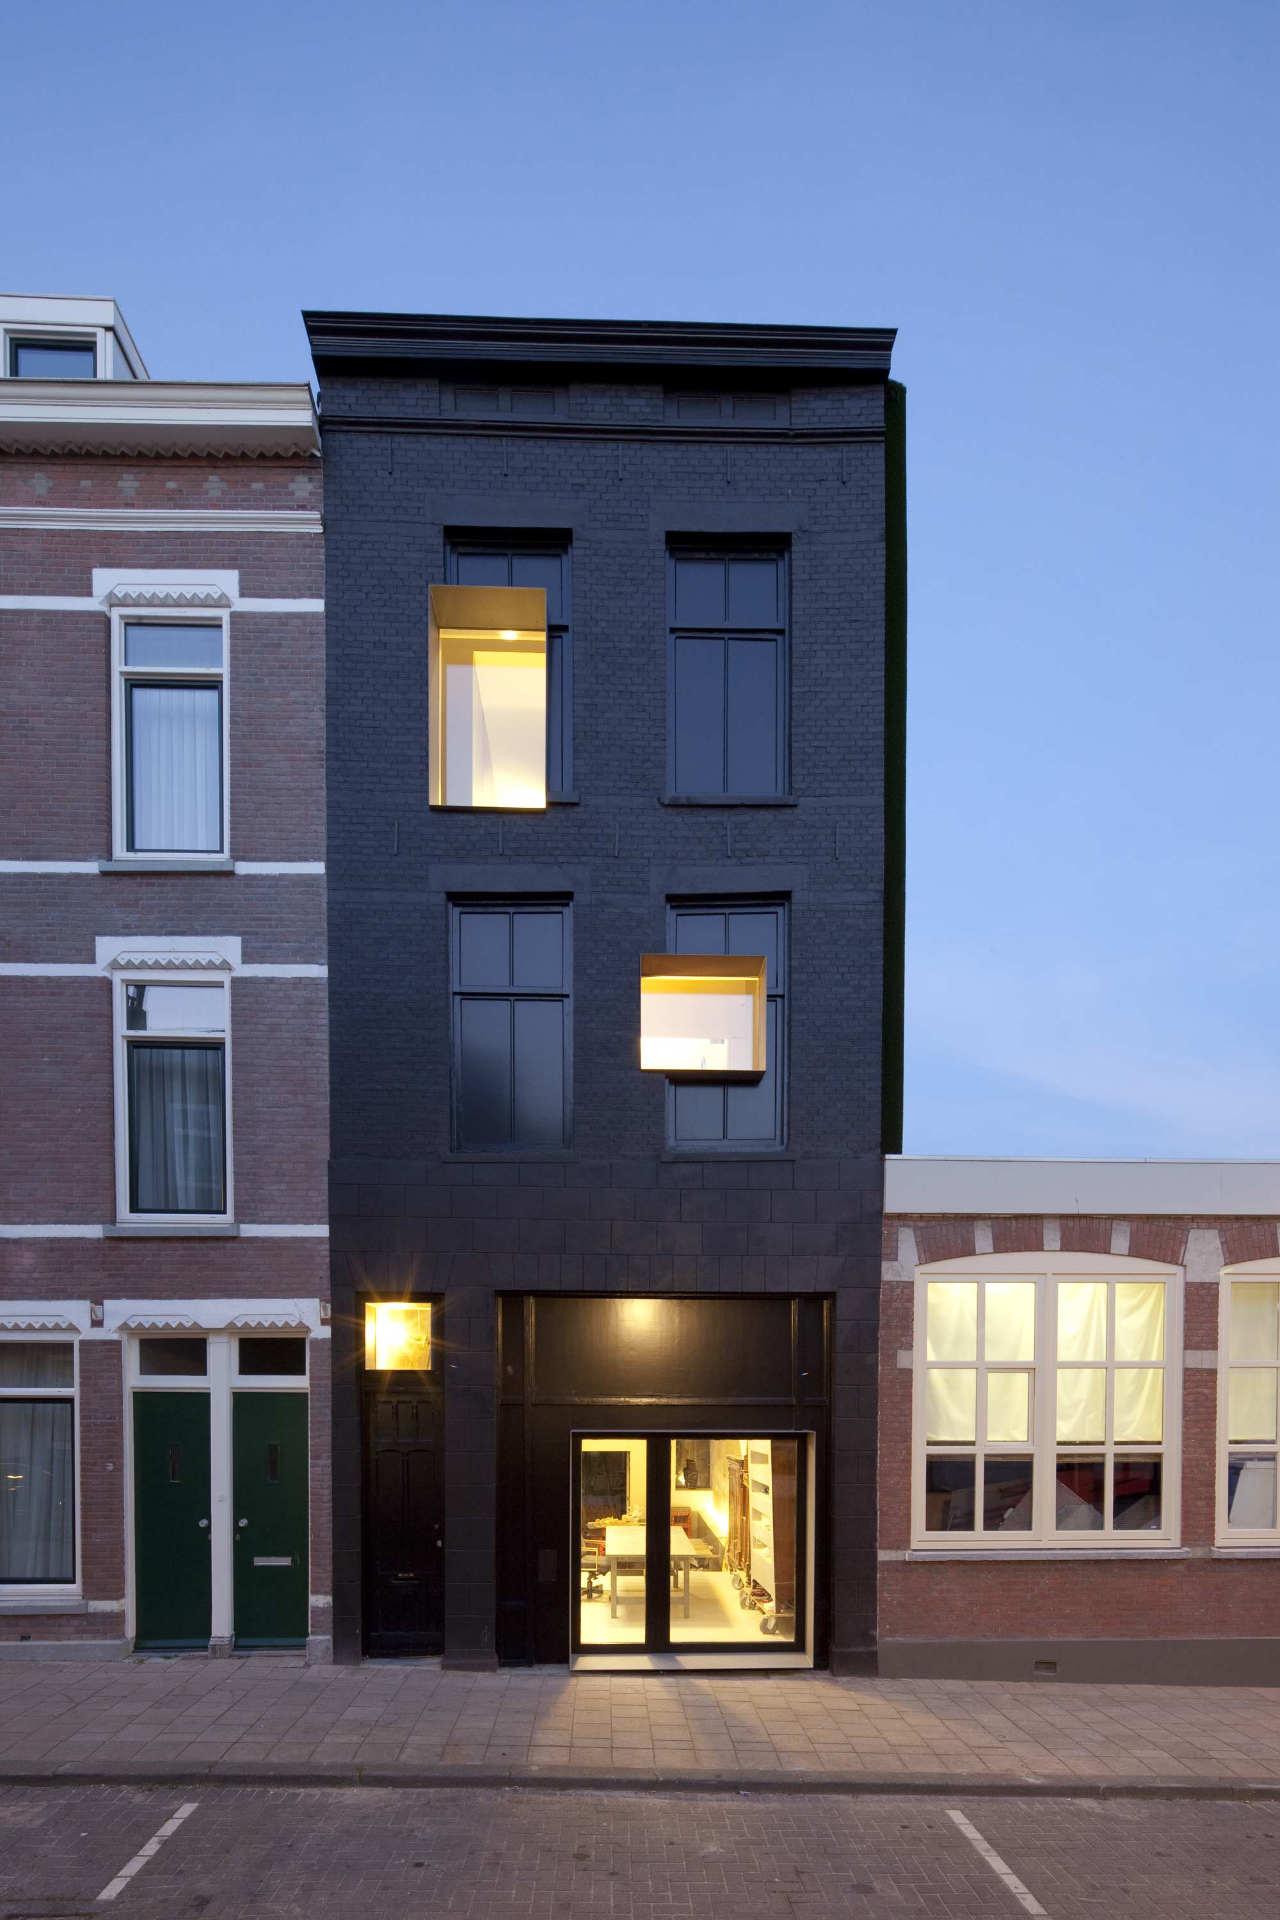 Pérola Negra / Studio Rolf.fr + Zecc Architecten, © Frank Hanswijk